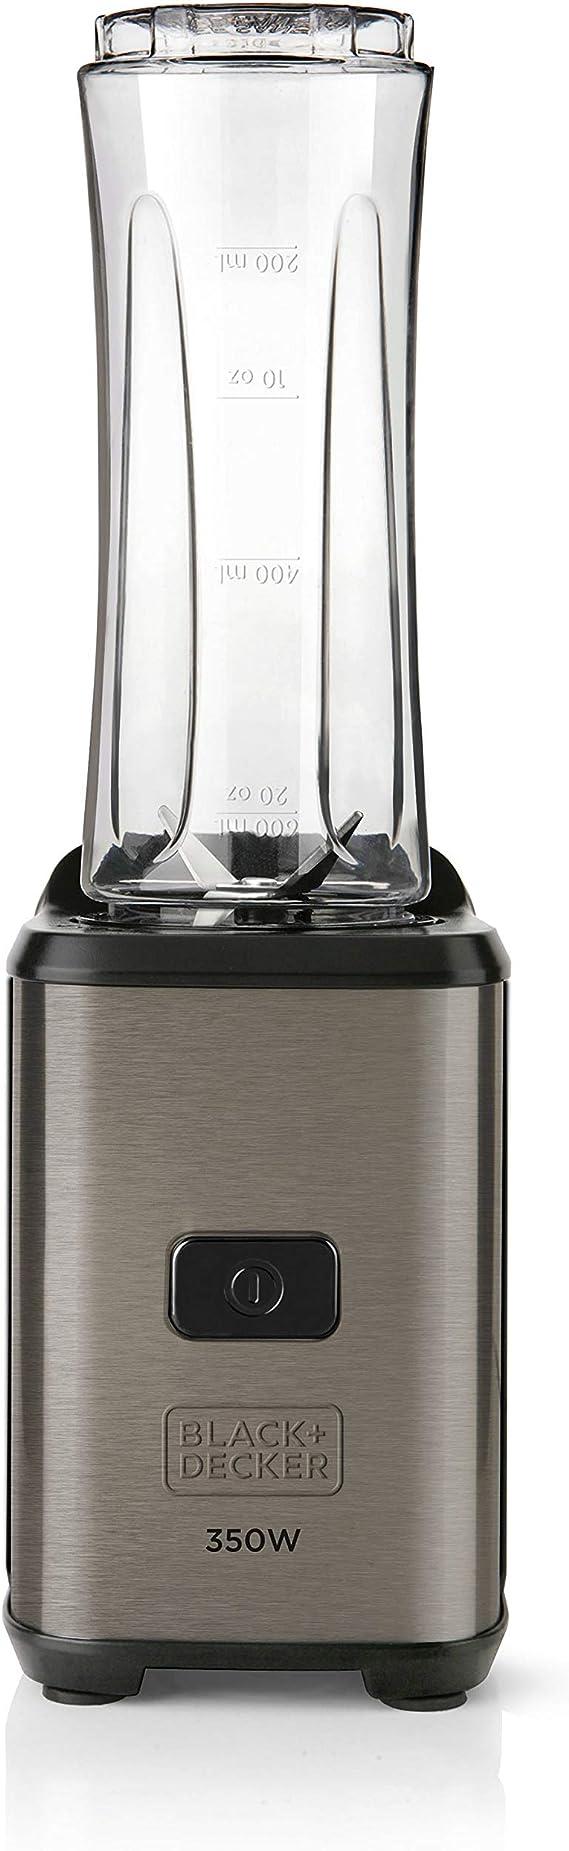 Black+Decker BXJBA350E Batidora de vaso 350 W, 600 milliliters ...